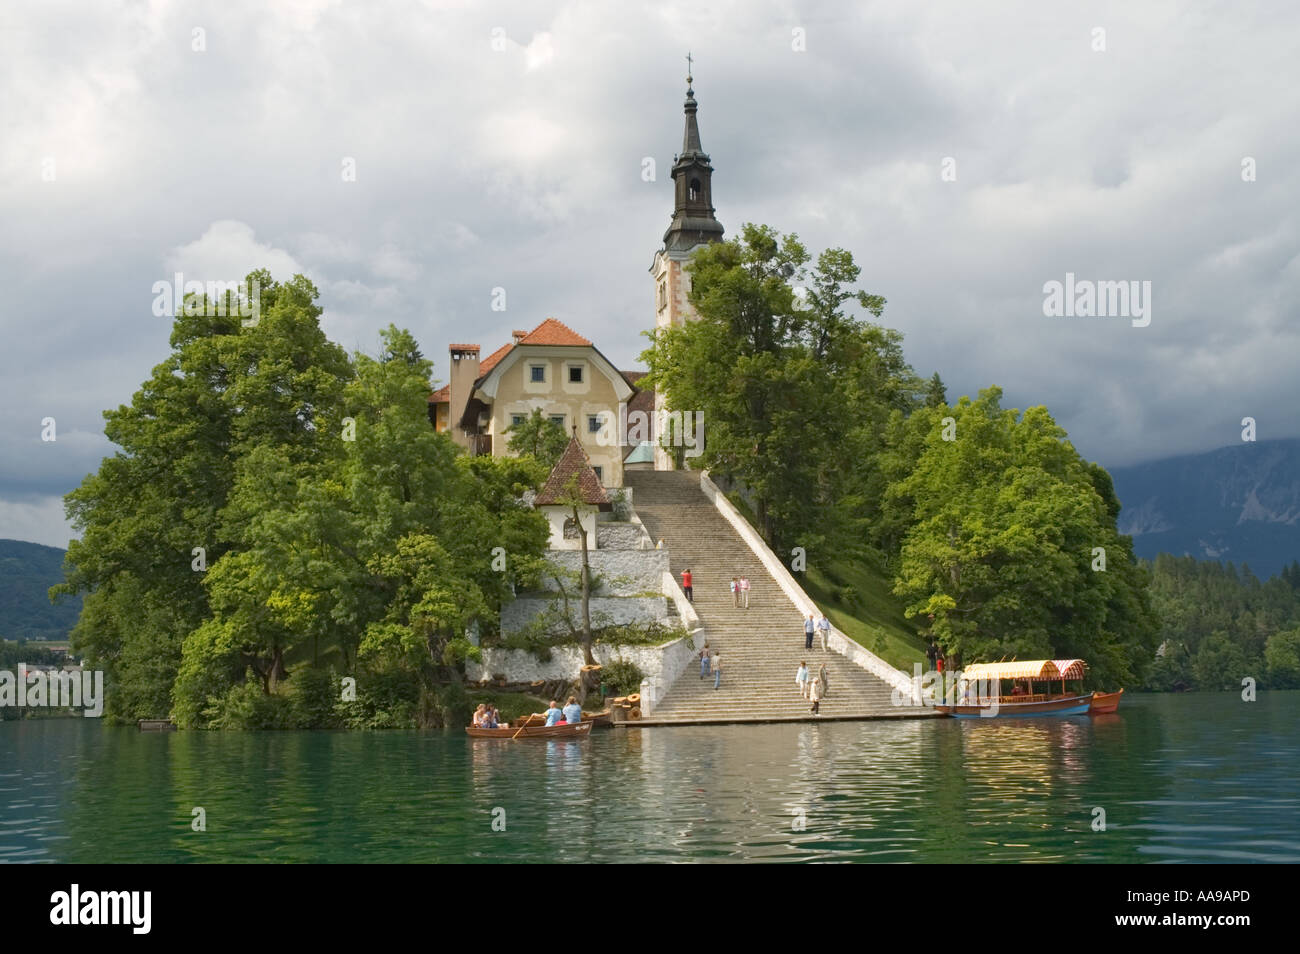 Lake Bled - Lake in Slovenia - Thousand Wonders